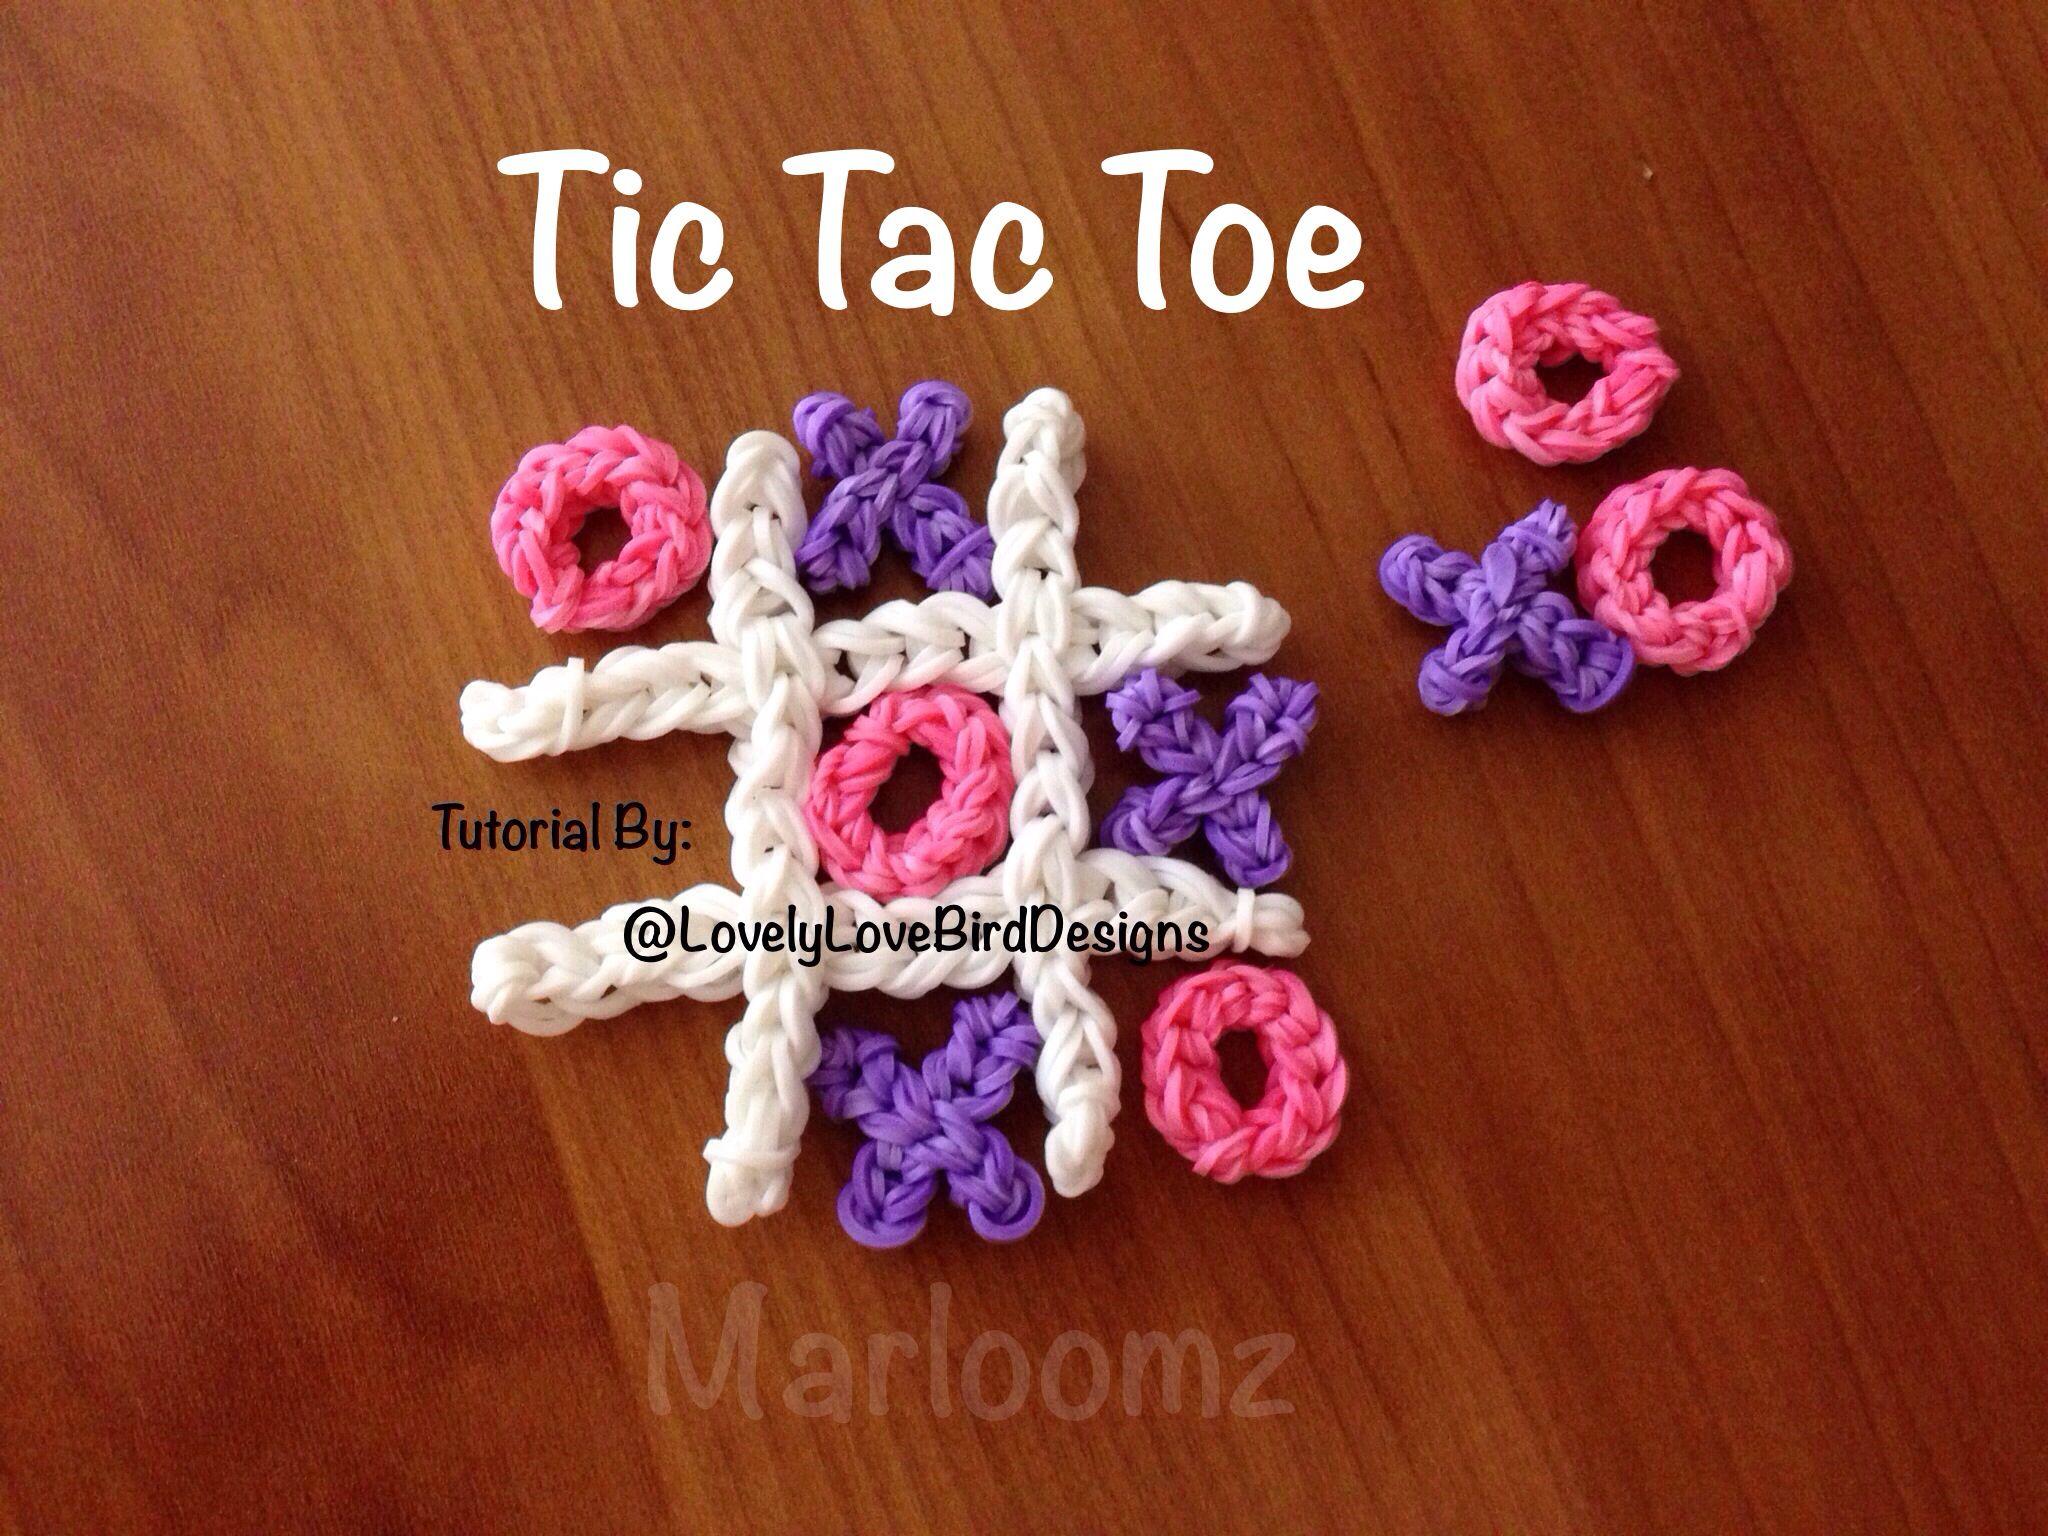 Rainbow Loom Tic Tac Toe Tutorial By Lovely Lovebird